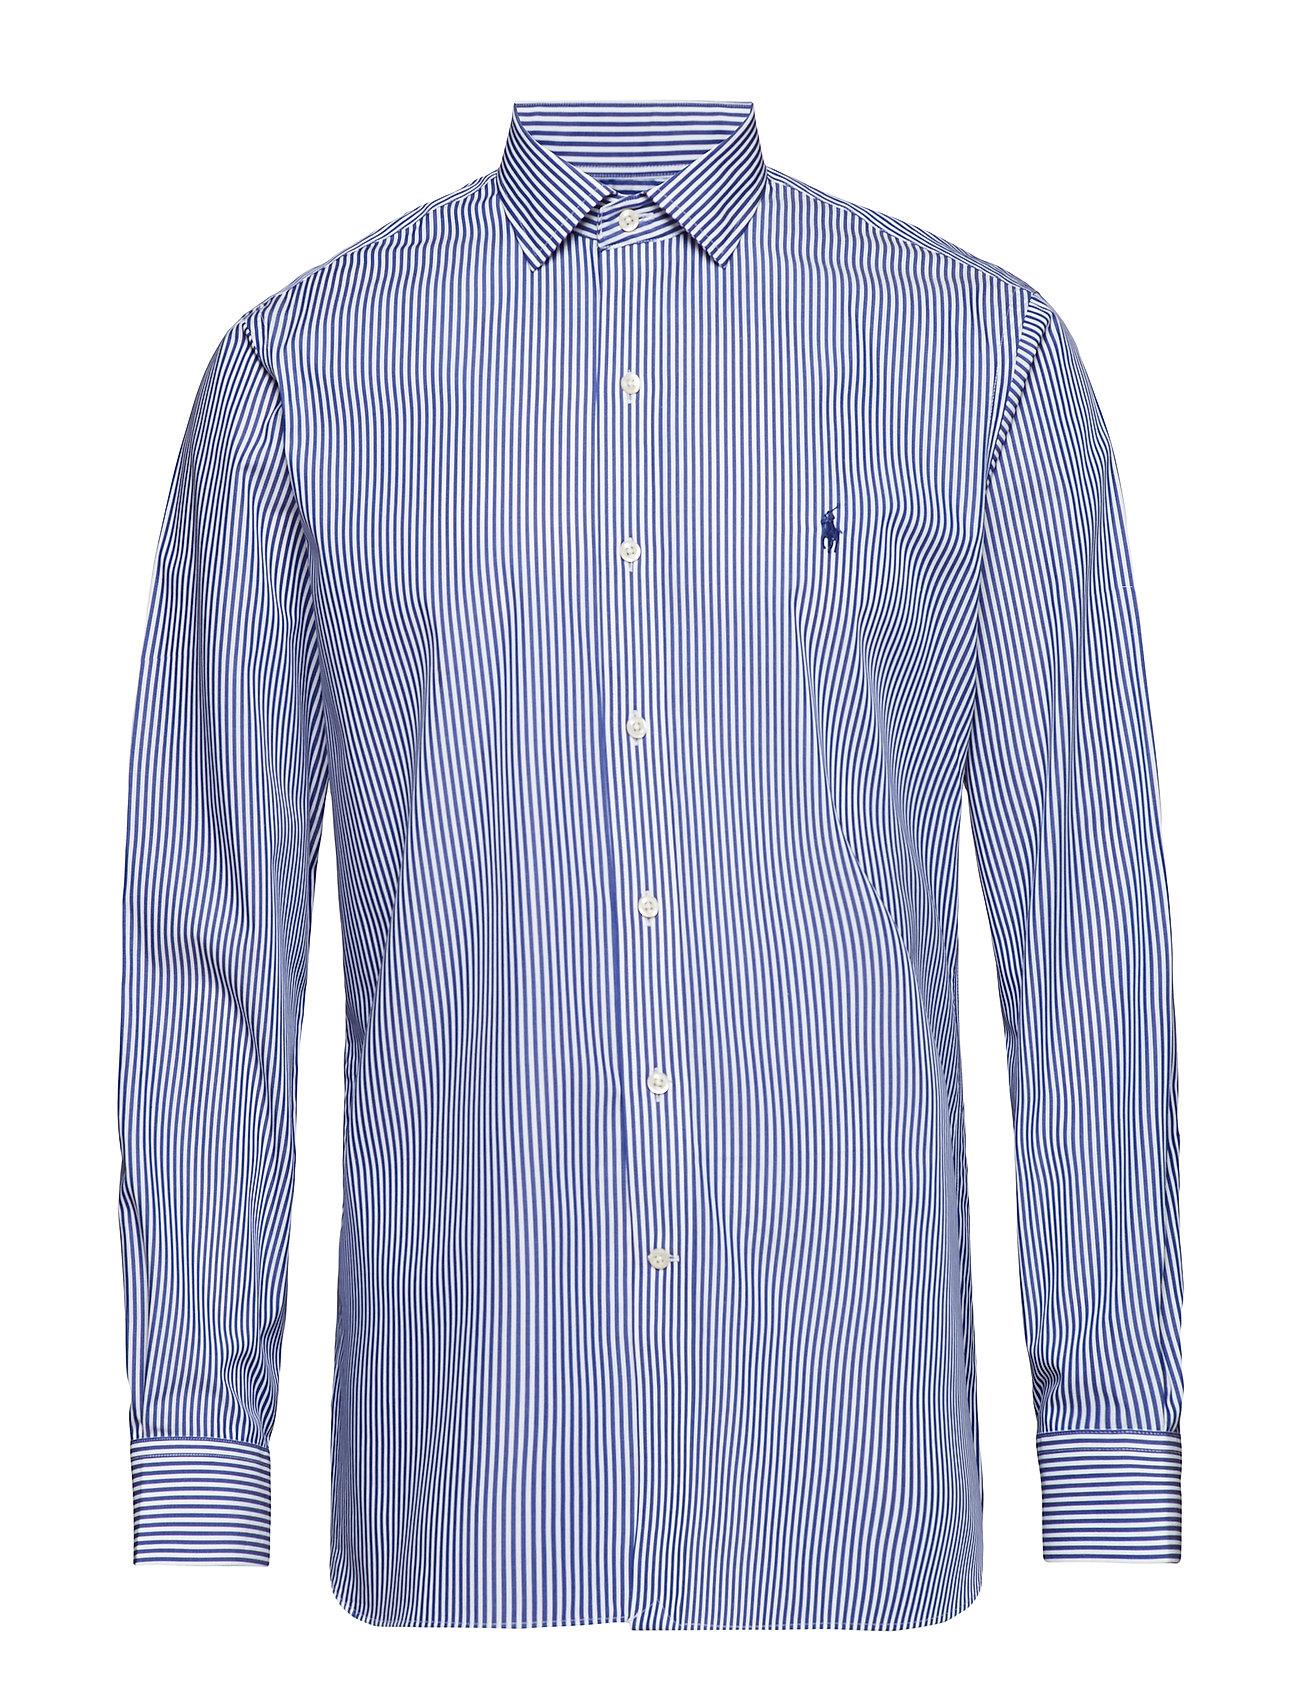 Polo Ralph Lauren Custom Fit Striped Shirt - 3213A ROYAL/WHITE